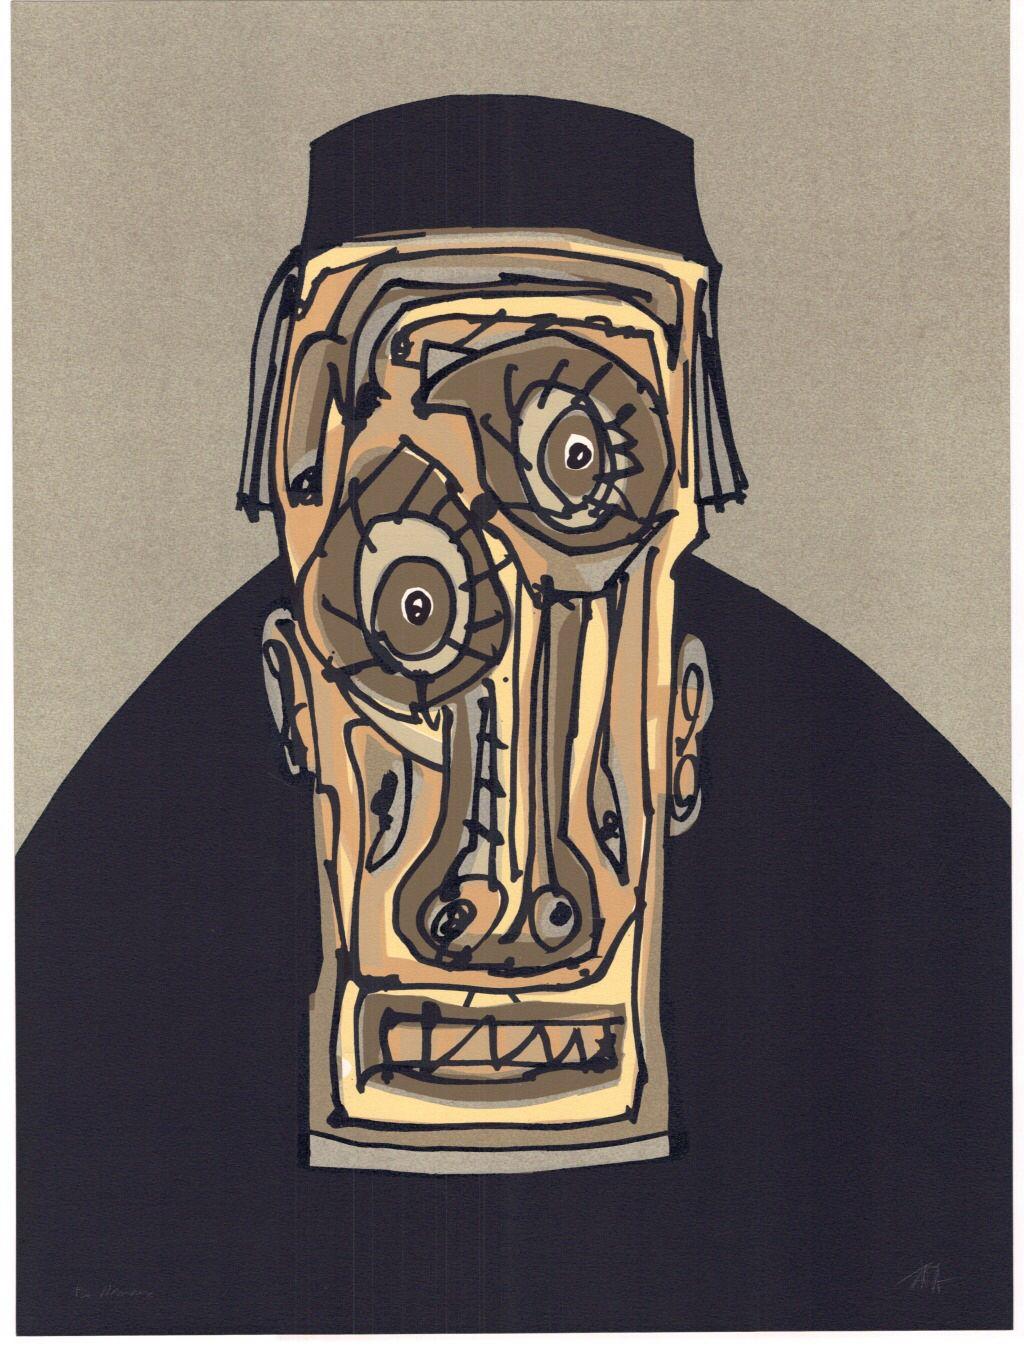 Pin by Sam Hsu(shihfang Hsu)許世芳 on Antonio Saura Art